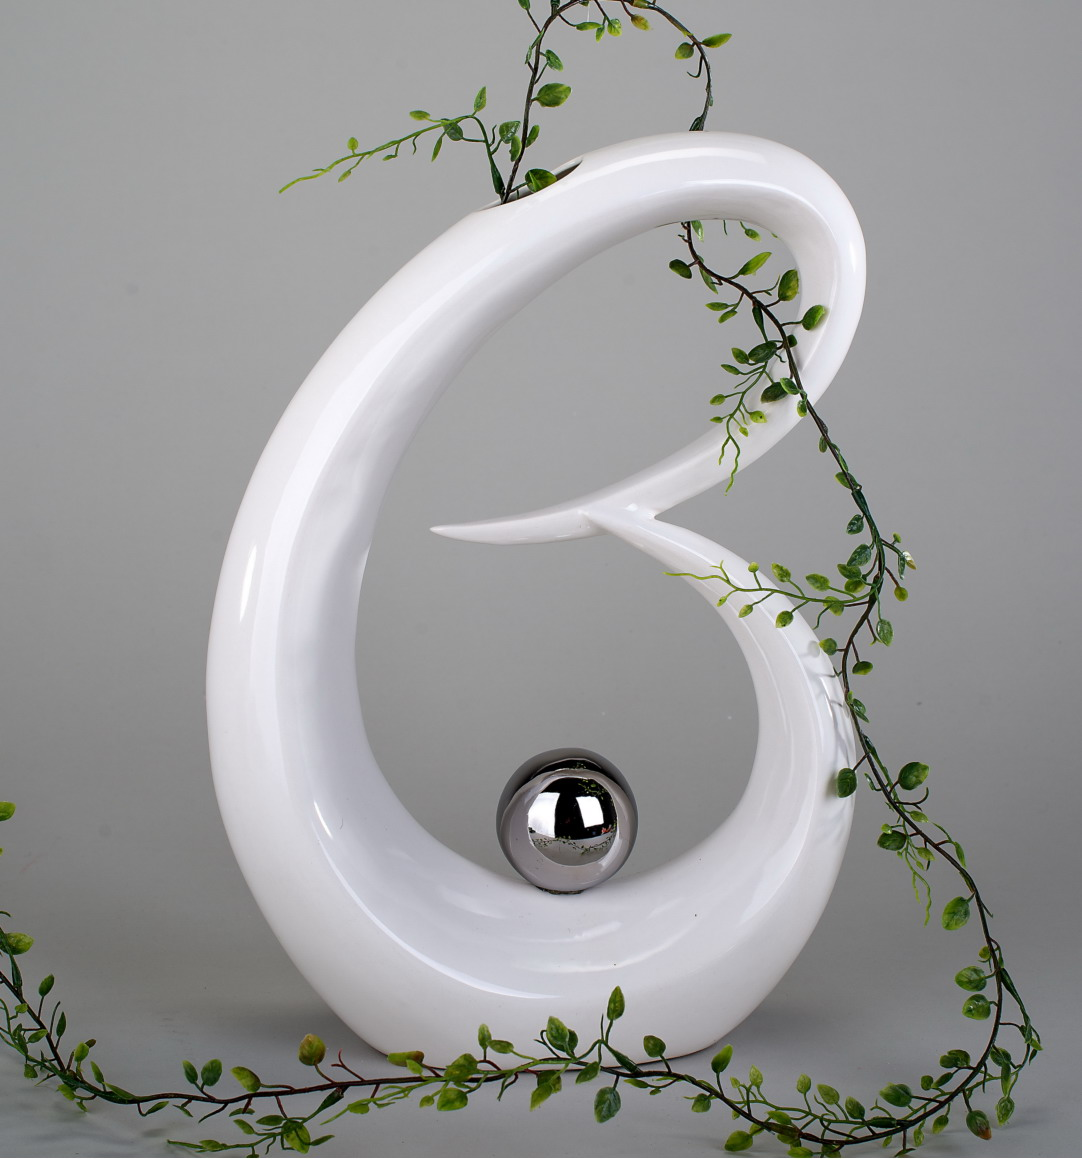 deko objekt vase artikel abstrakte skulptur figur mit silber kugel blumenvase ebay. Black Bedroom Furniture Sets. Home Design Ideas